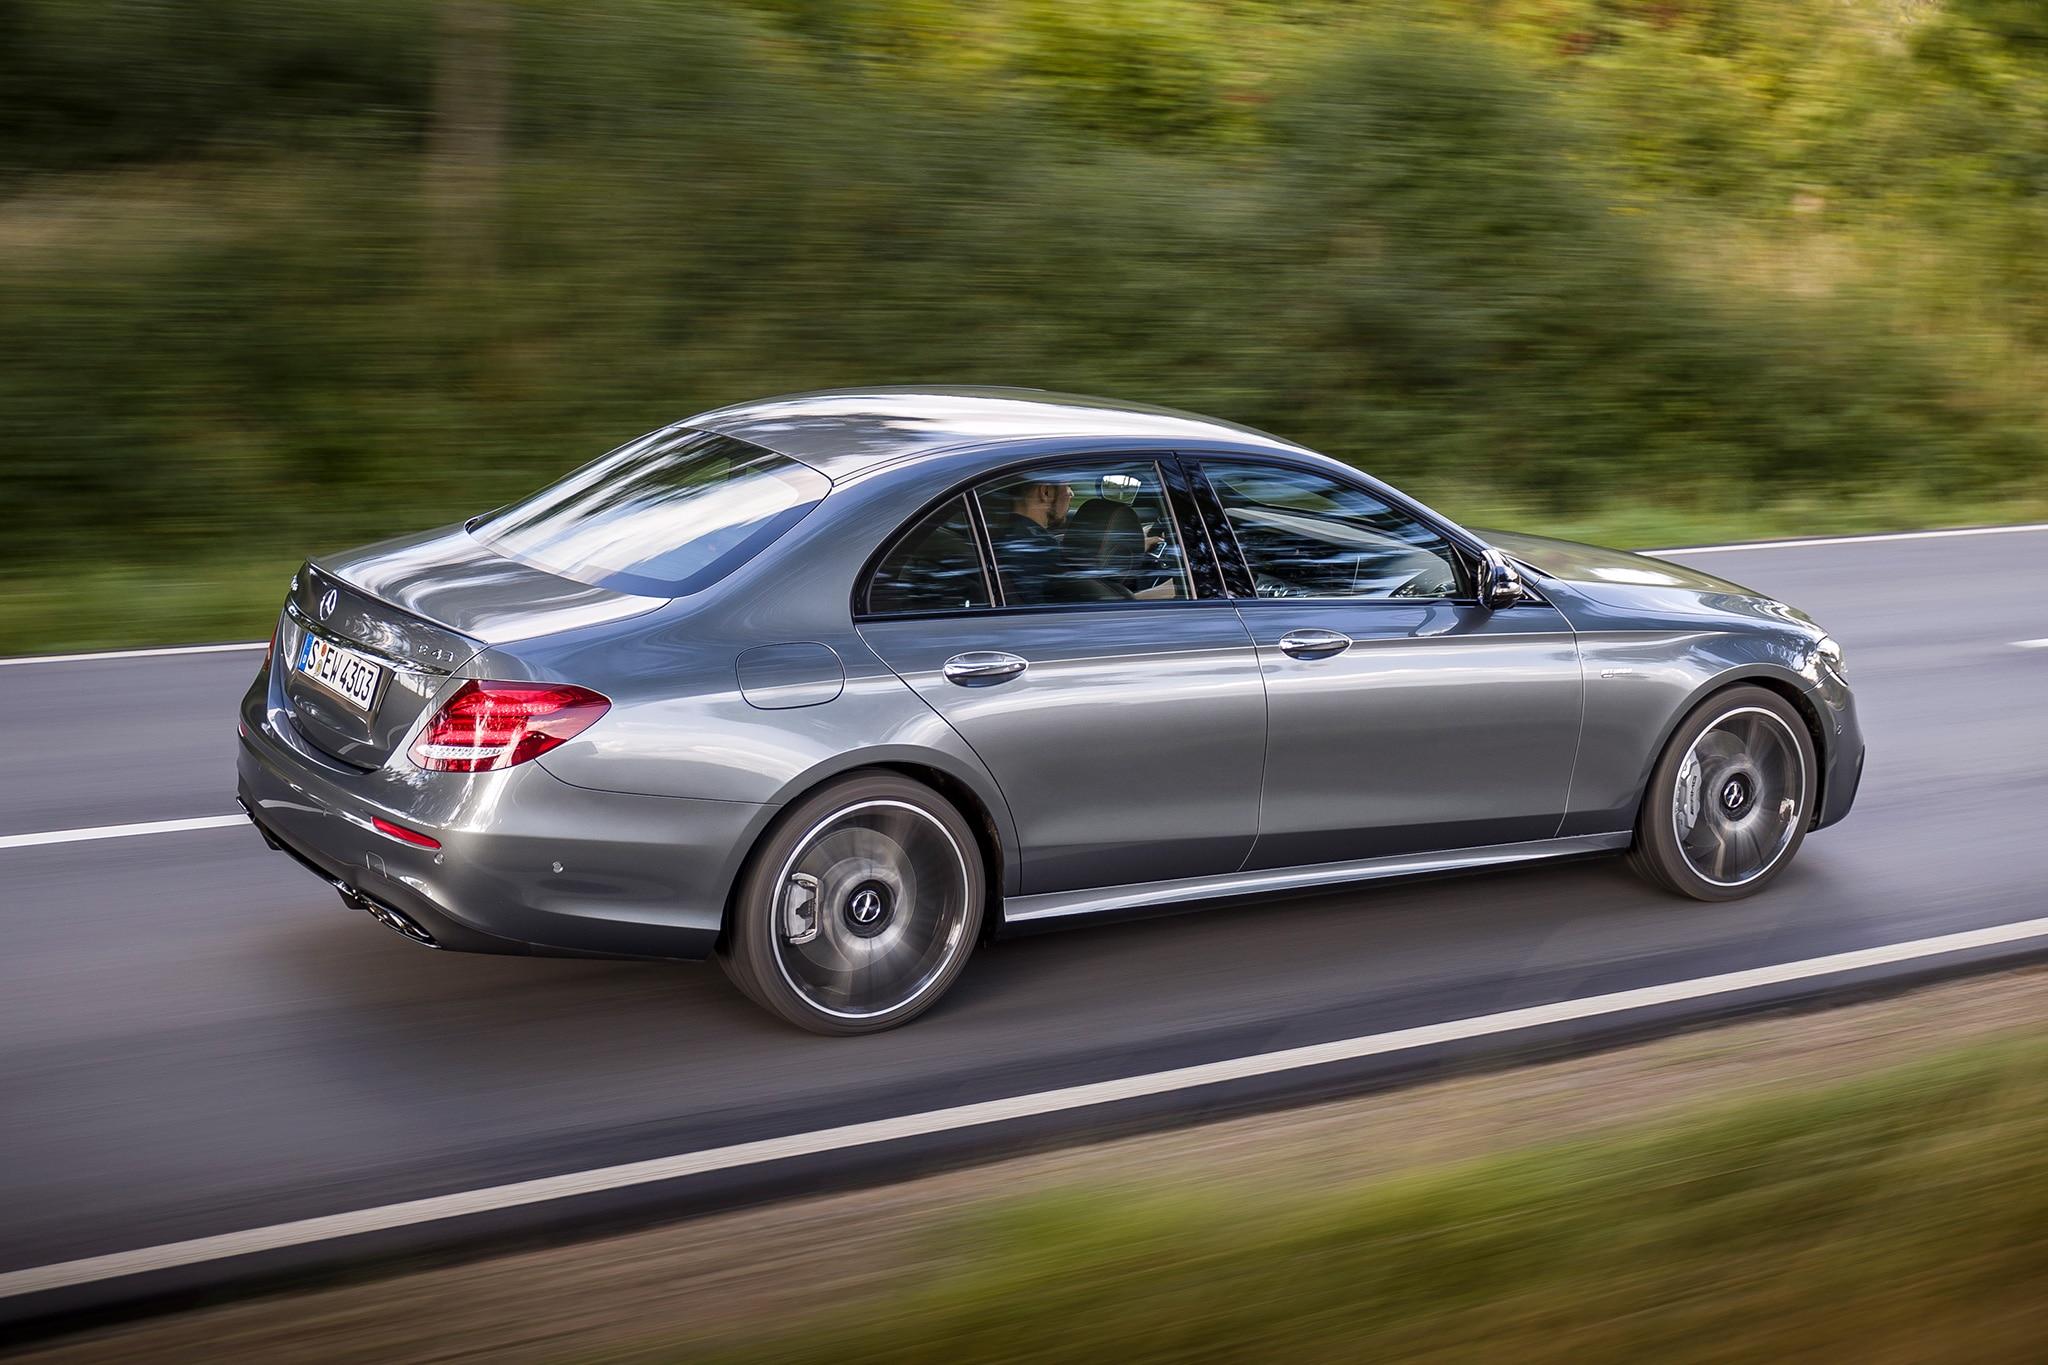 http://st.automobilemag.com/uploads/sites/11/2016/09/2017-Mercedes-AMG-E43-sedan-rear-three-quarter-in-motion-03.jpg